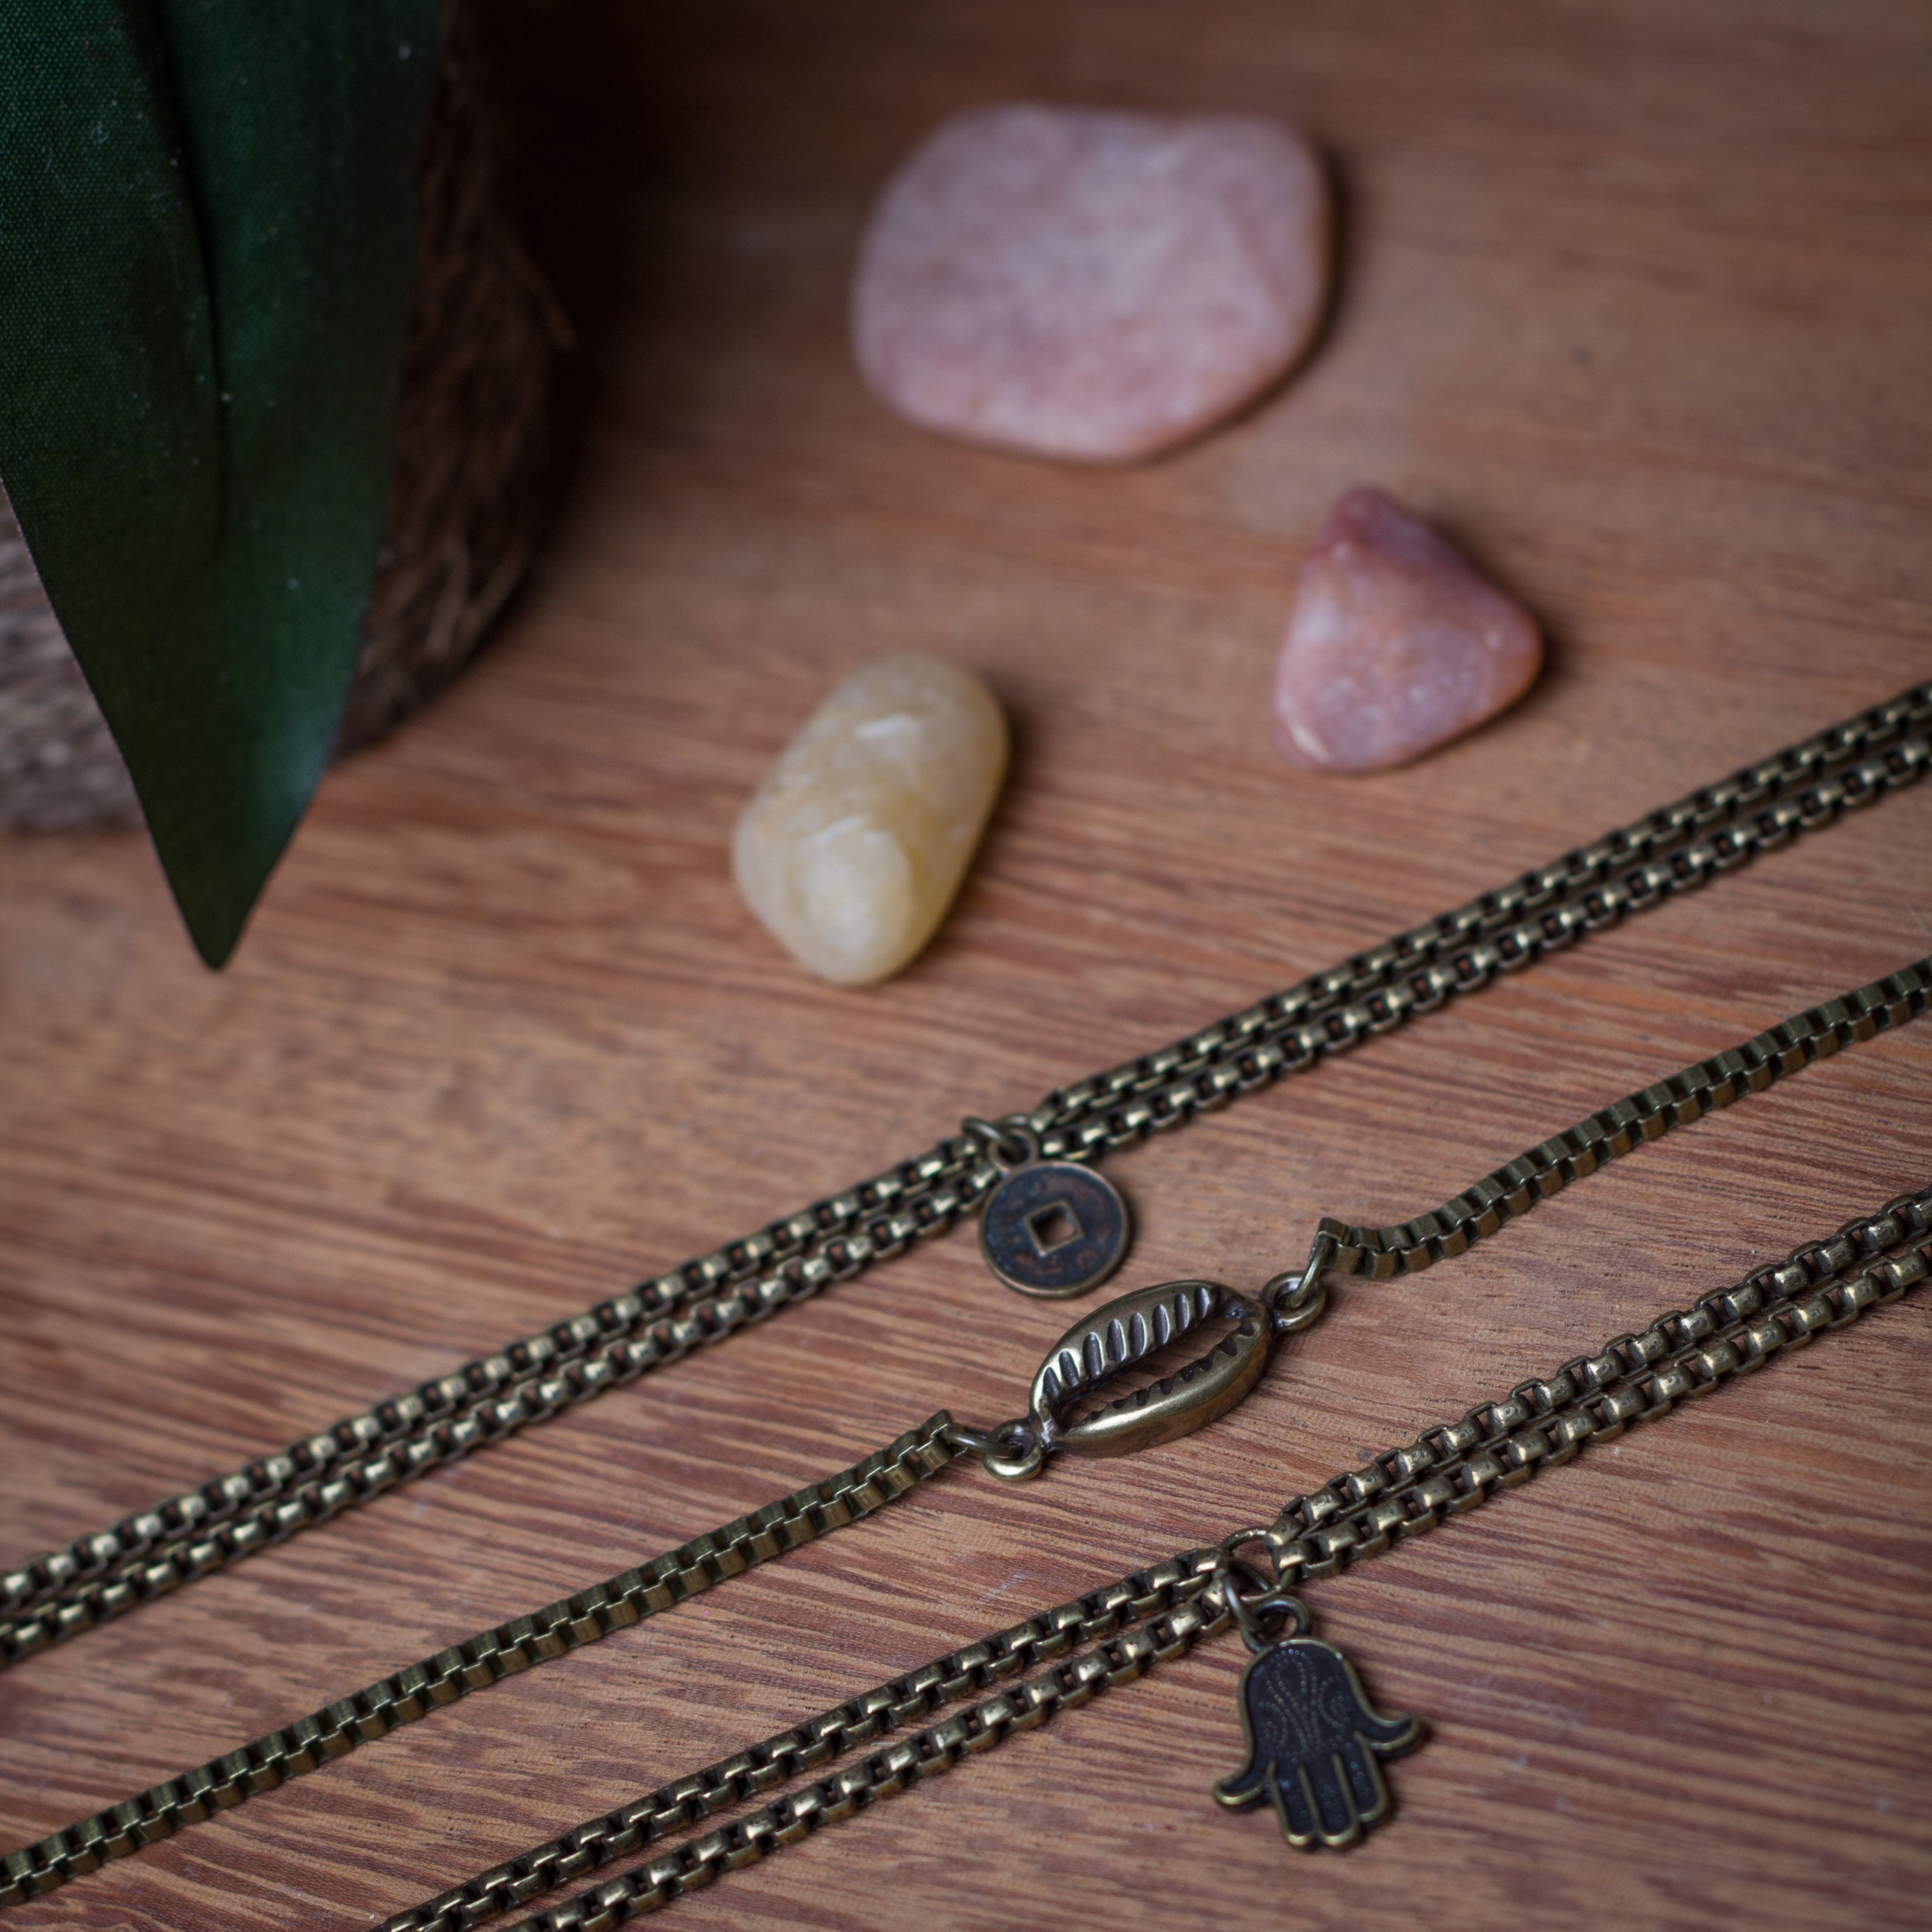 Pulseiras Chains super zen! #zen #pena #feather #ourovelho #folha #buda #hamsa #moedachinesa #luck #acessorios #amomuito